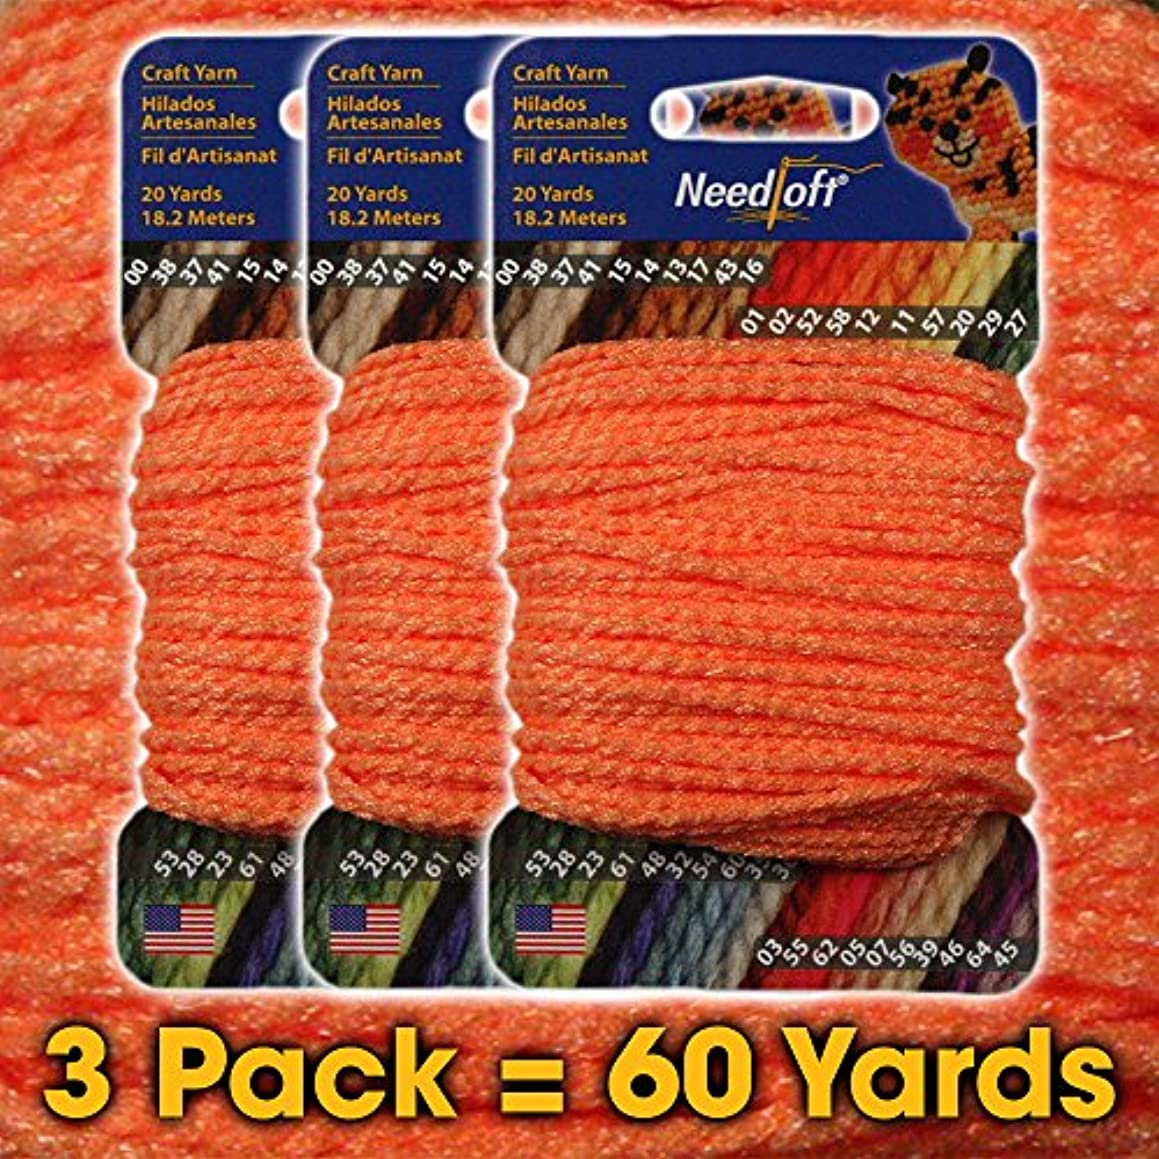 #58 Bright Orange - Needloft Craft Yarn 3 Pack 60 Yards (3x20yds)